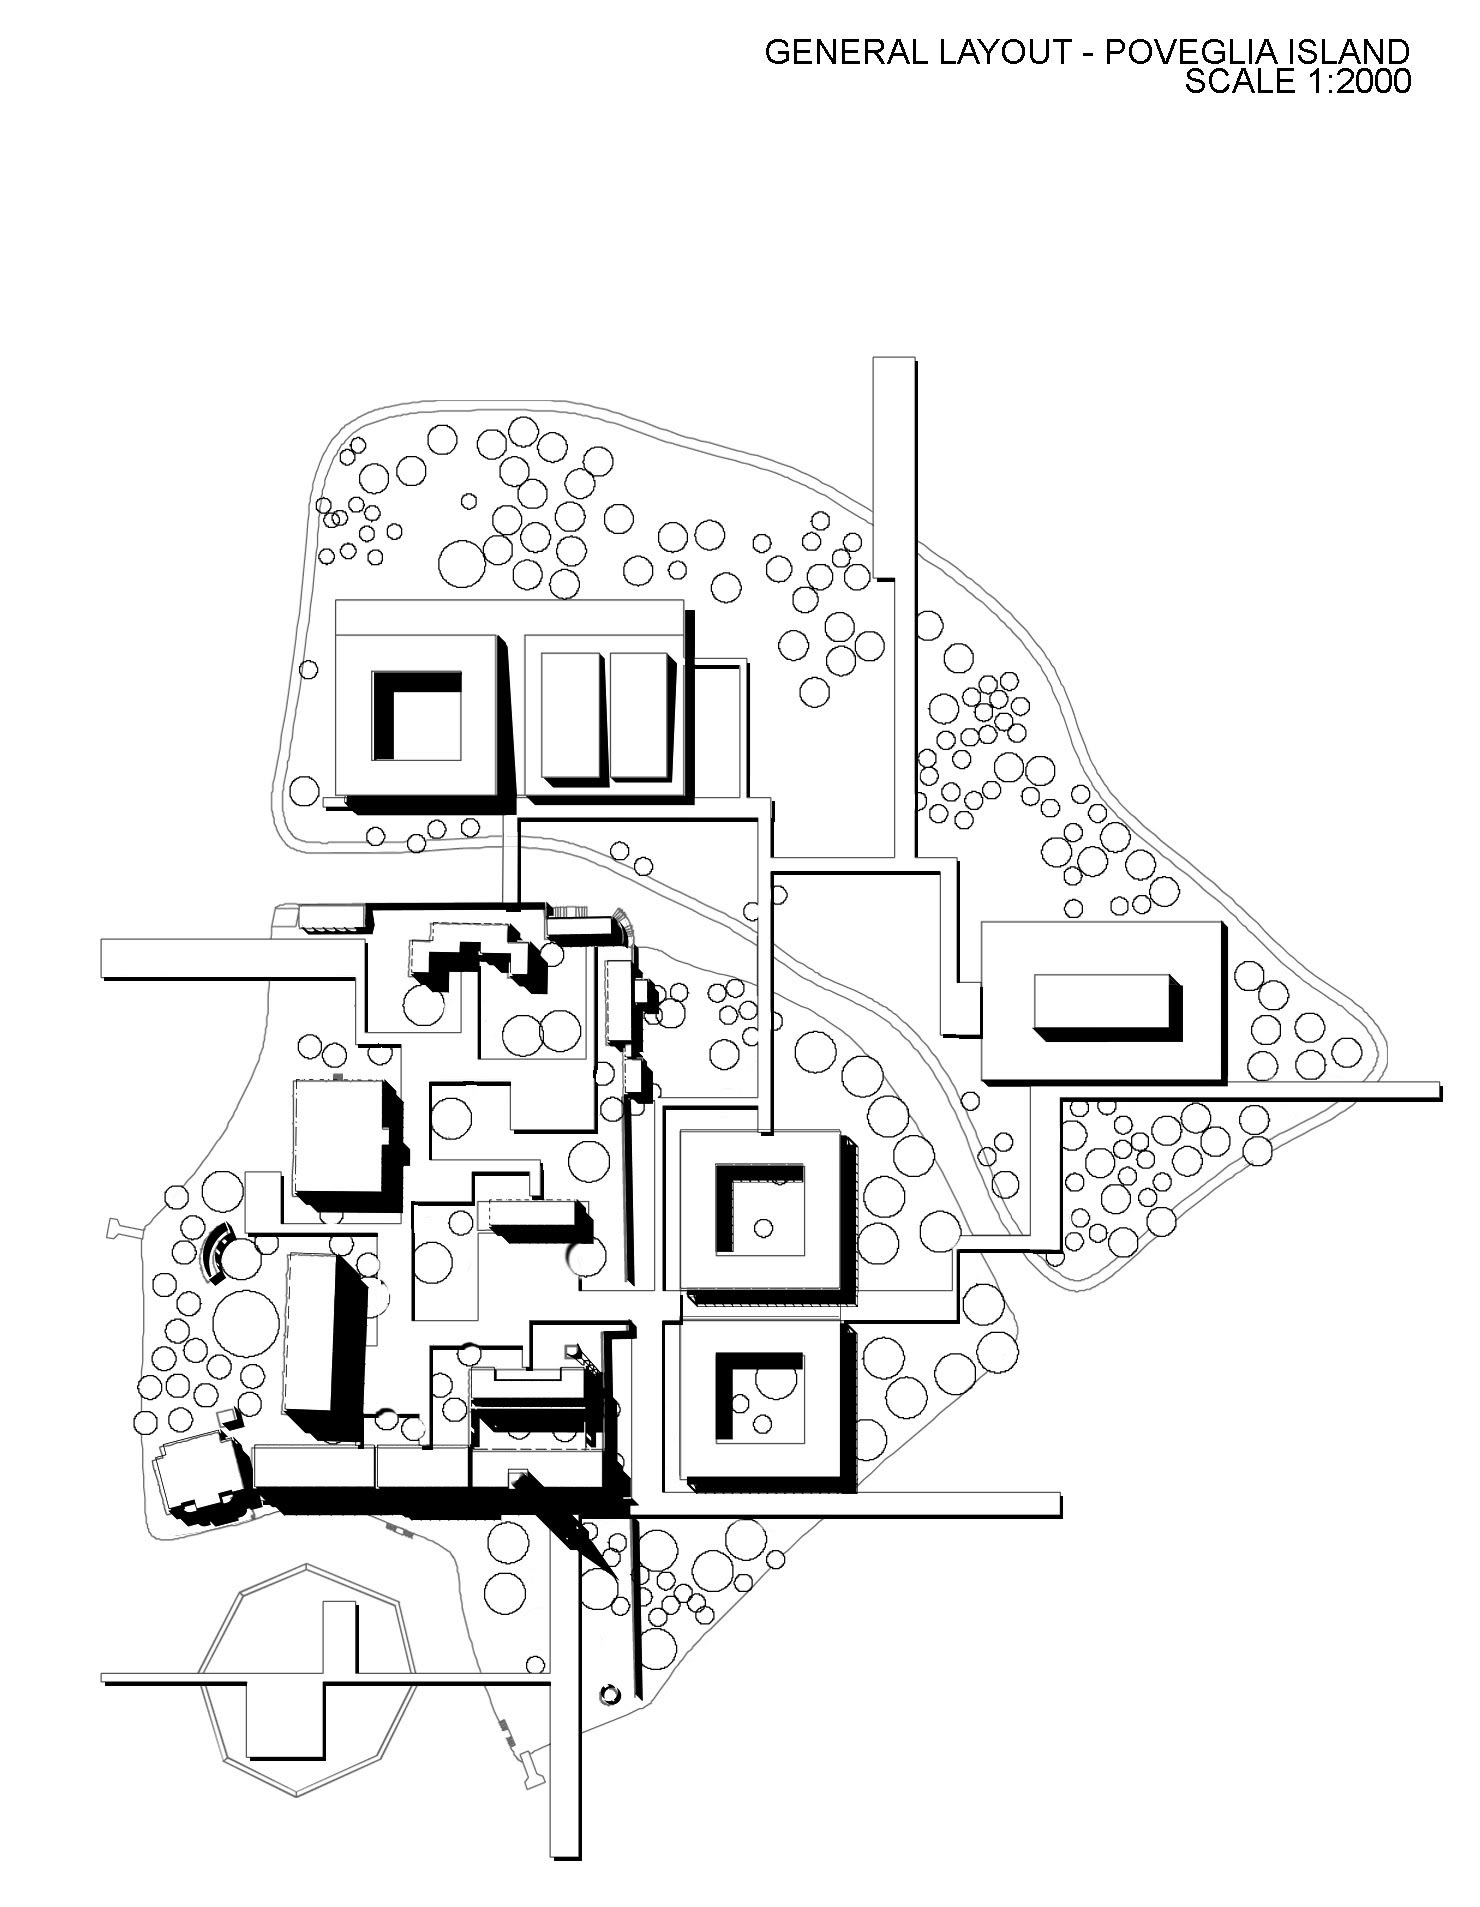 1480x1907 Rrs Studio University Campus Poveglia Island